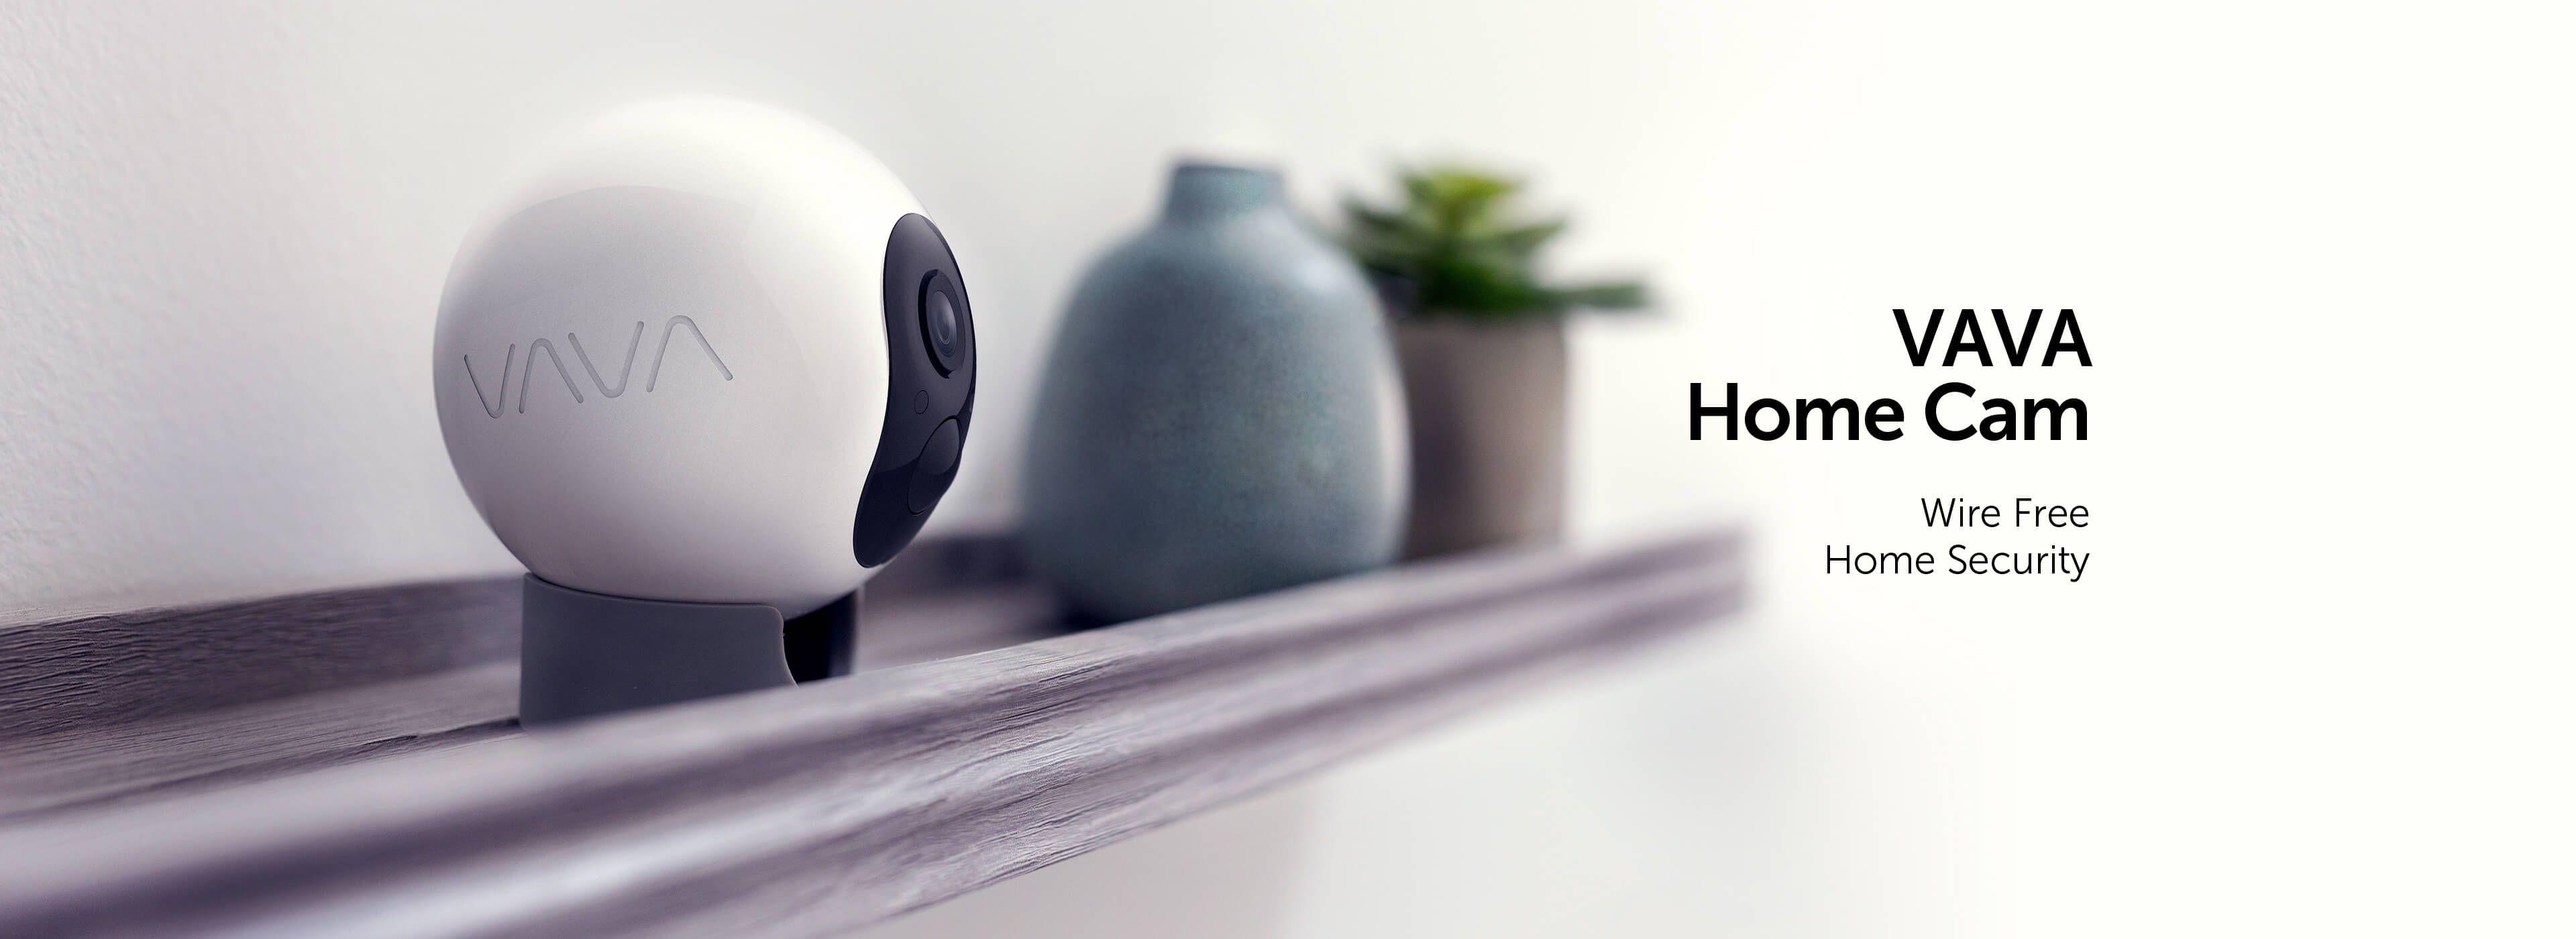 VAVA Official Website Home security, Aim high, Technology